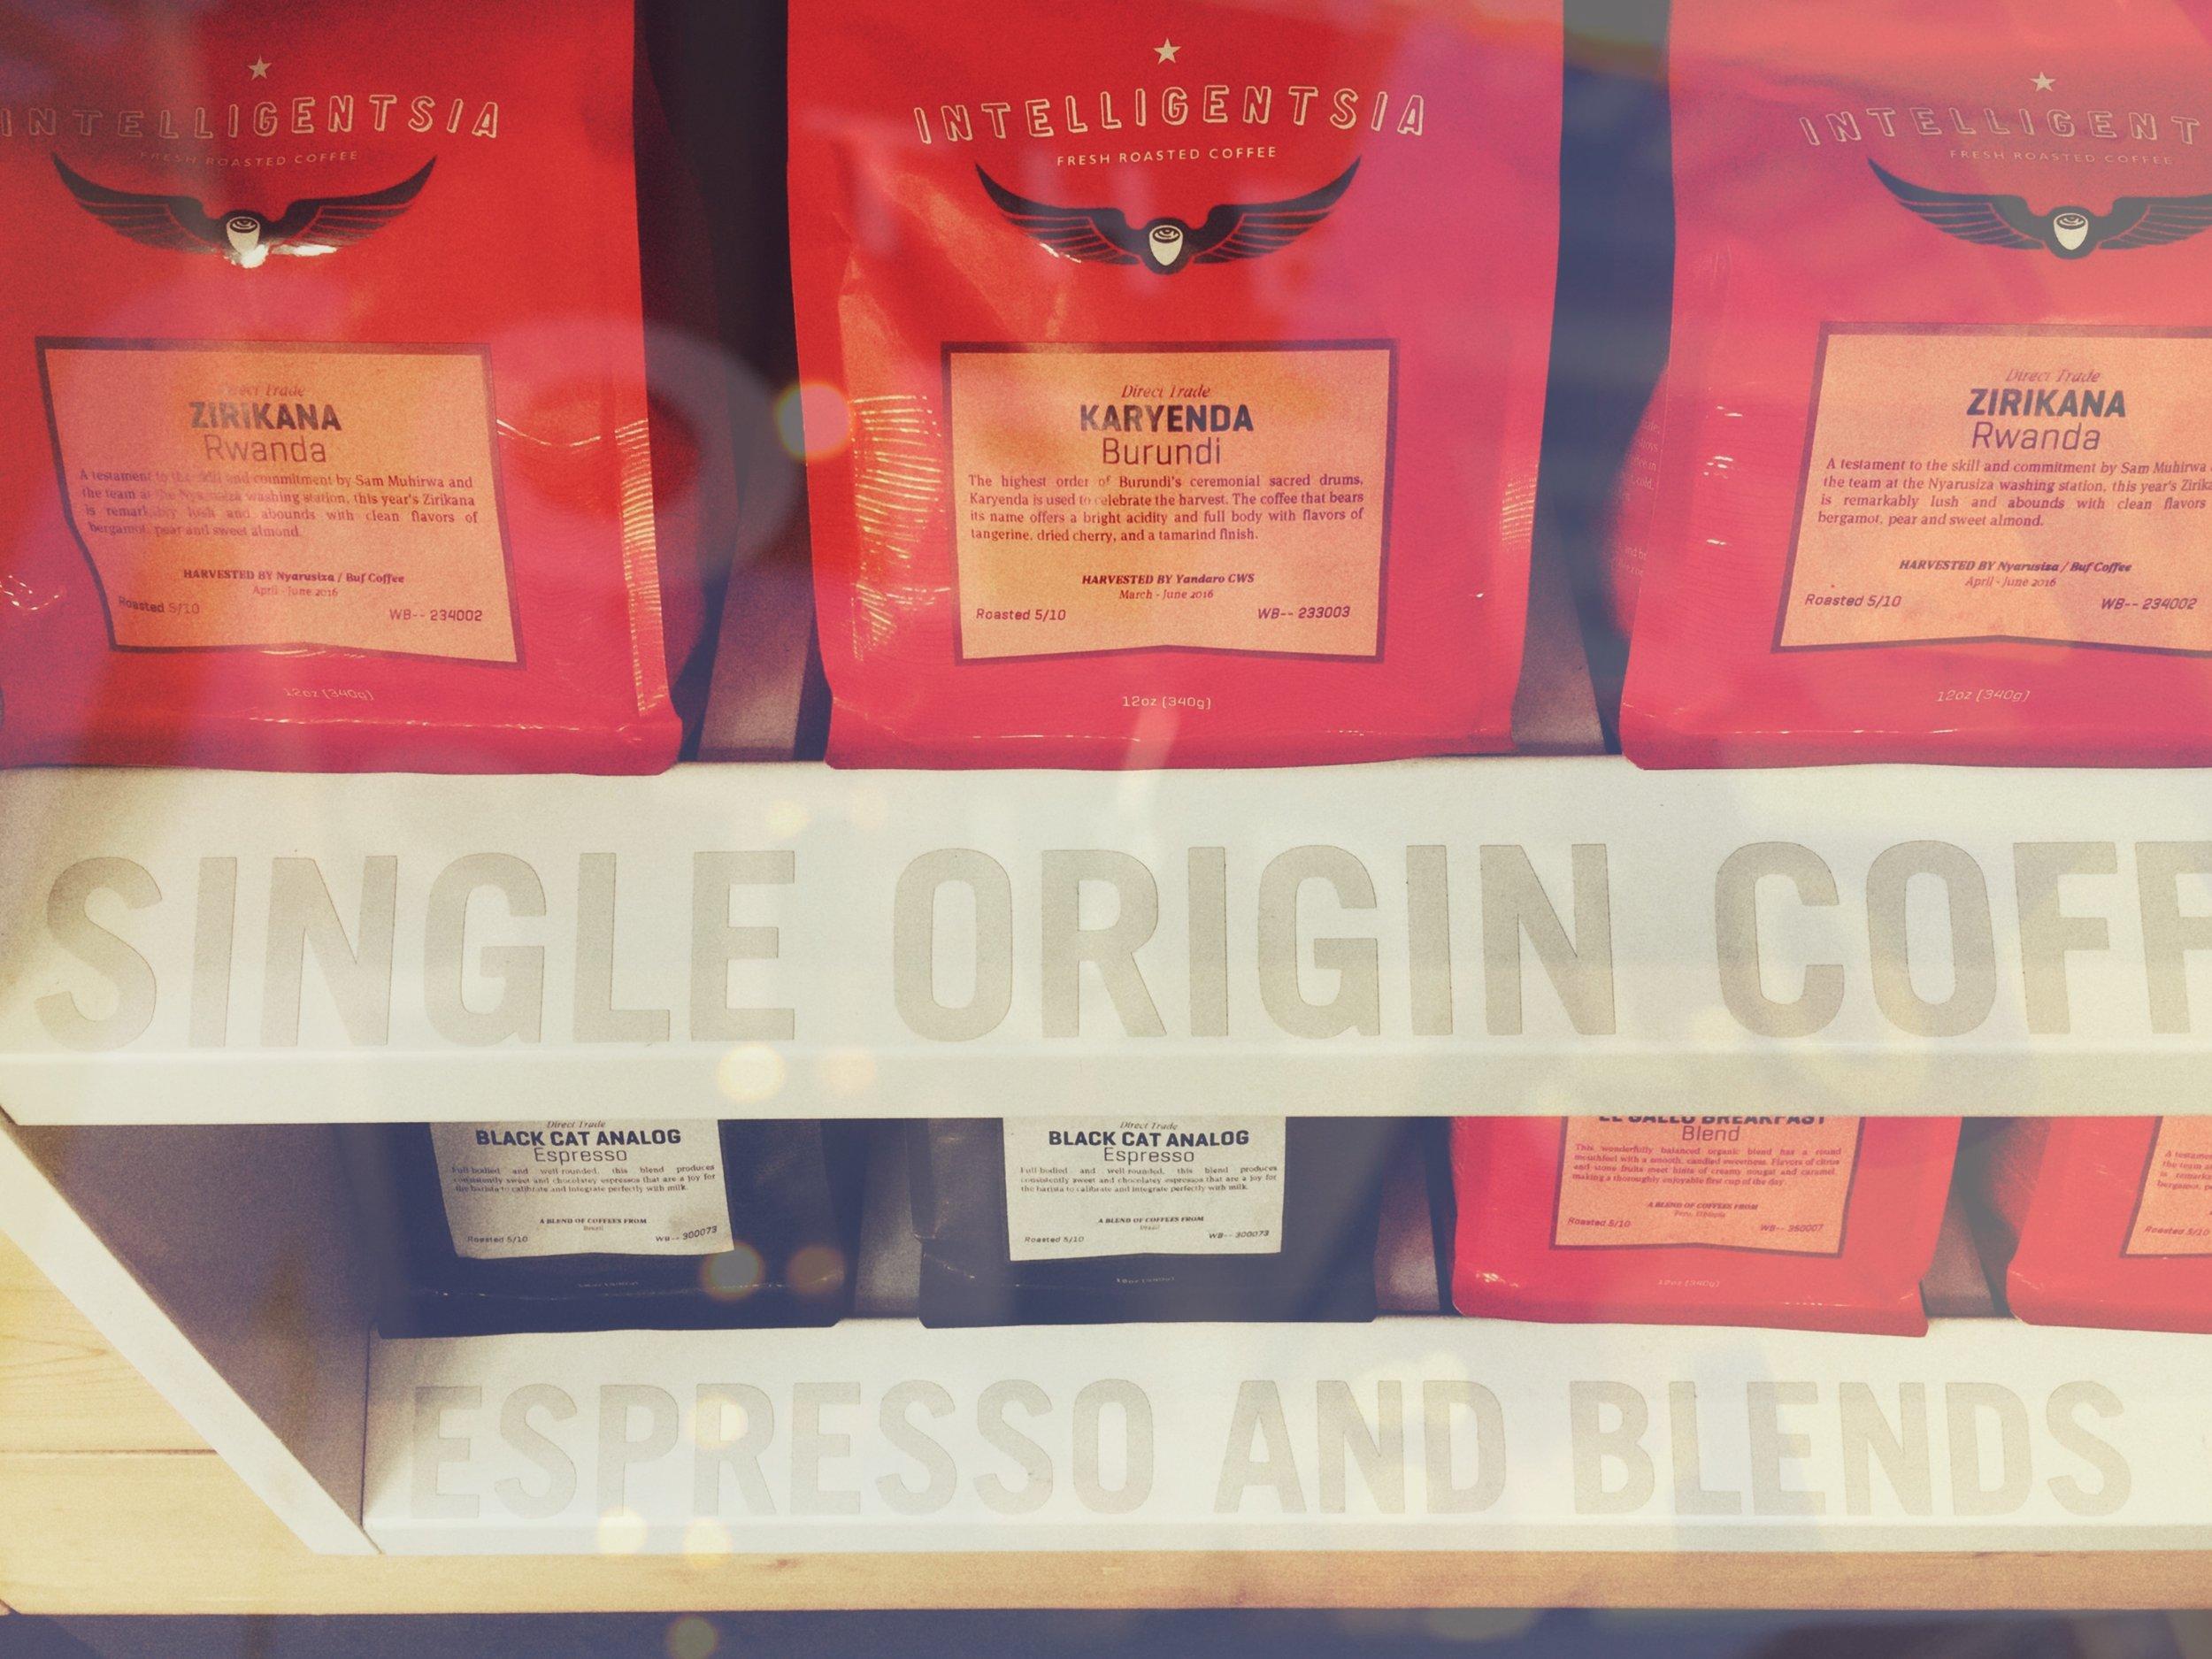 The-coffee-studio-intelligentsia-coffee-display.jpg